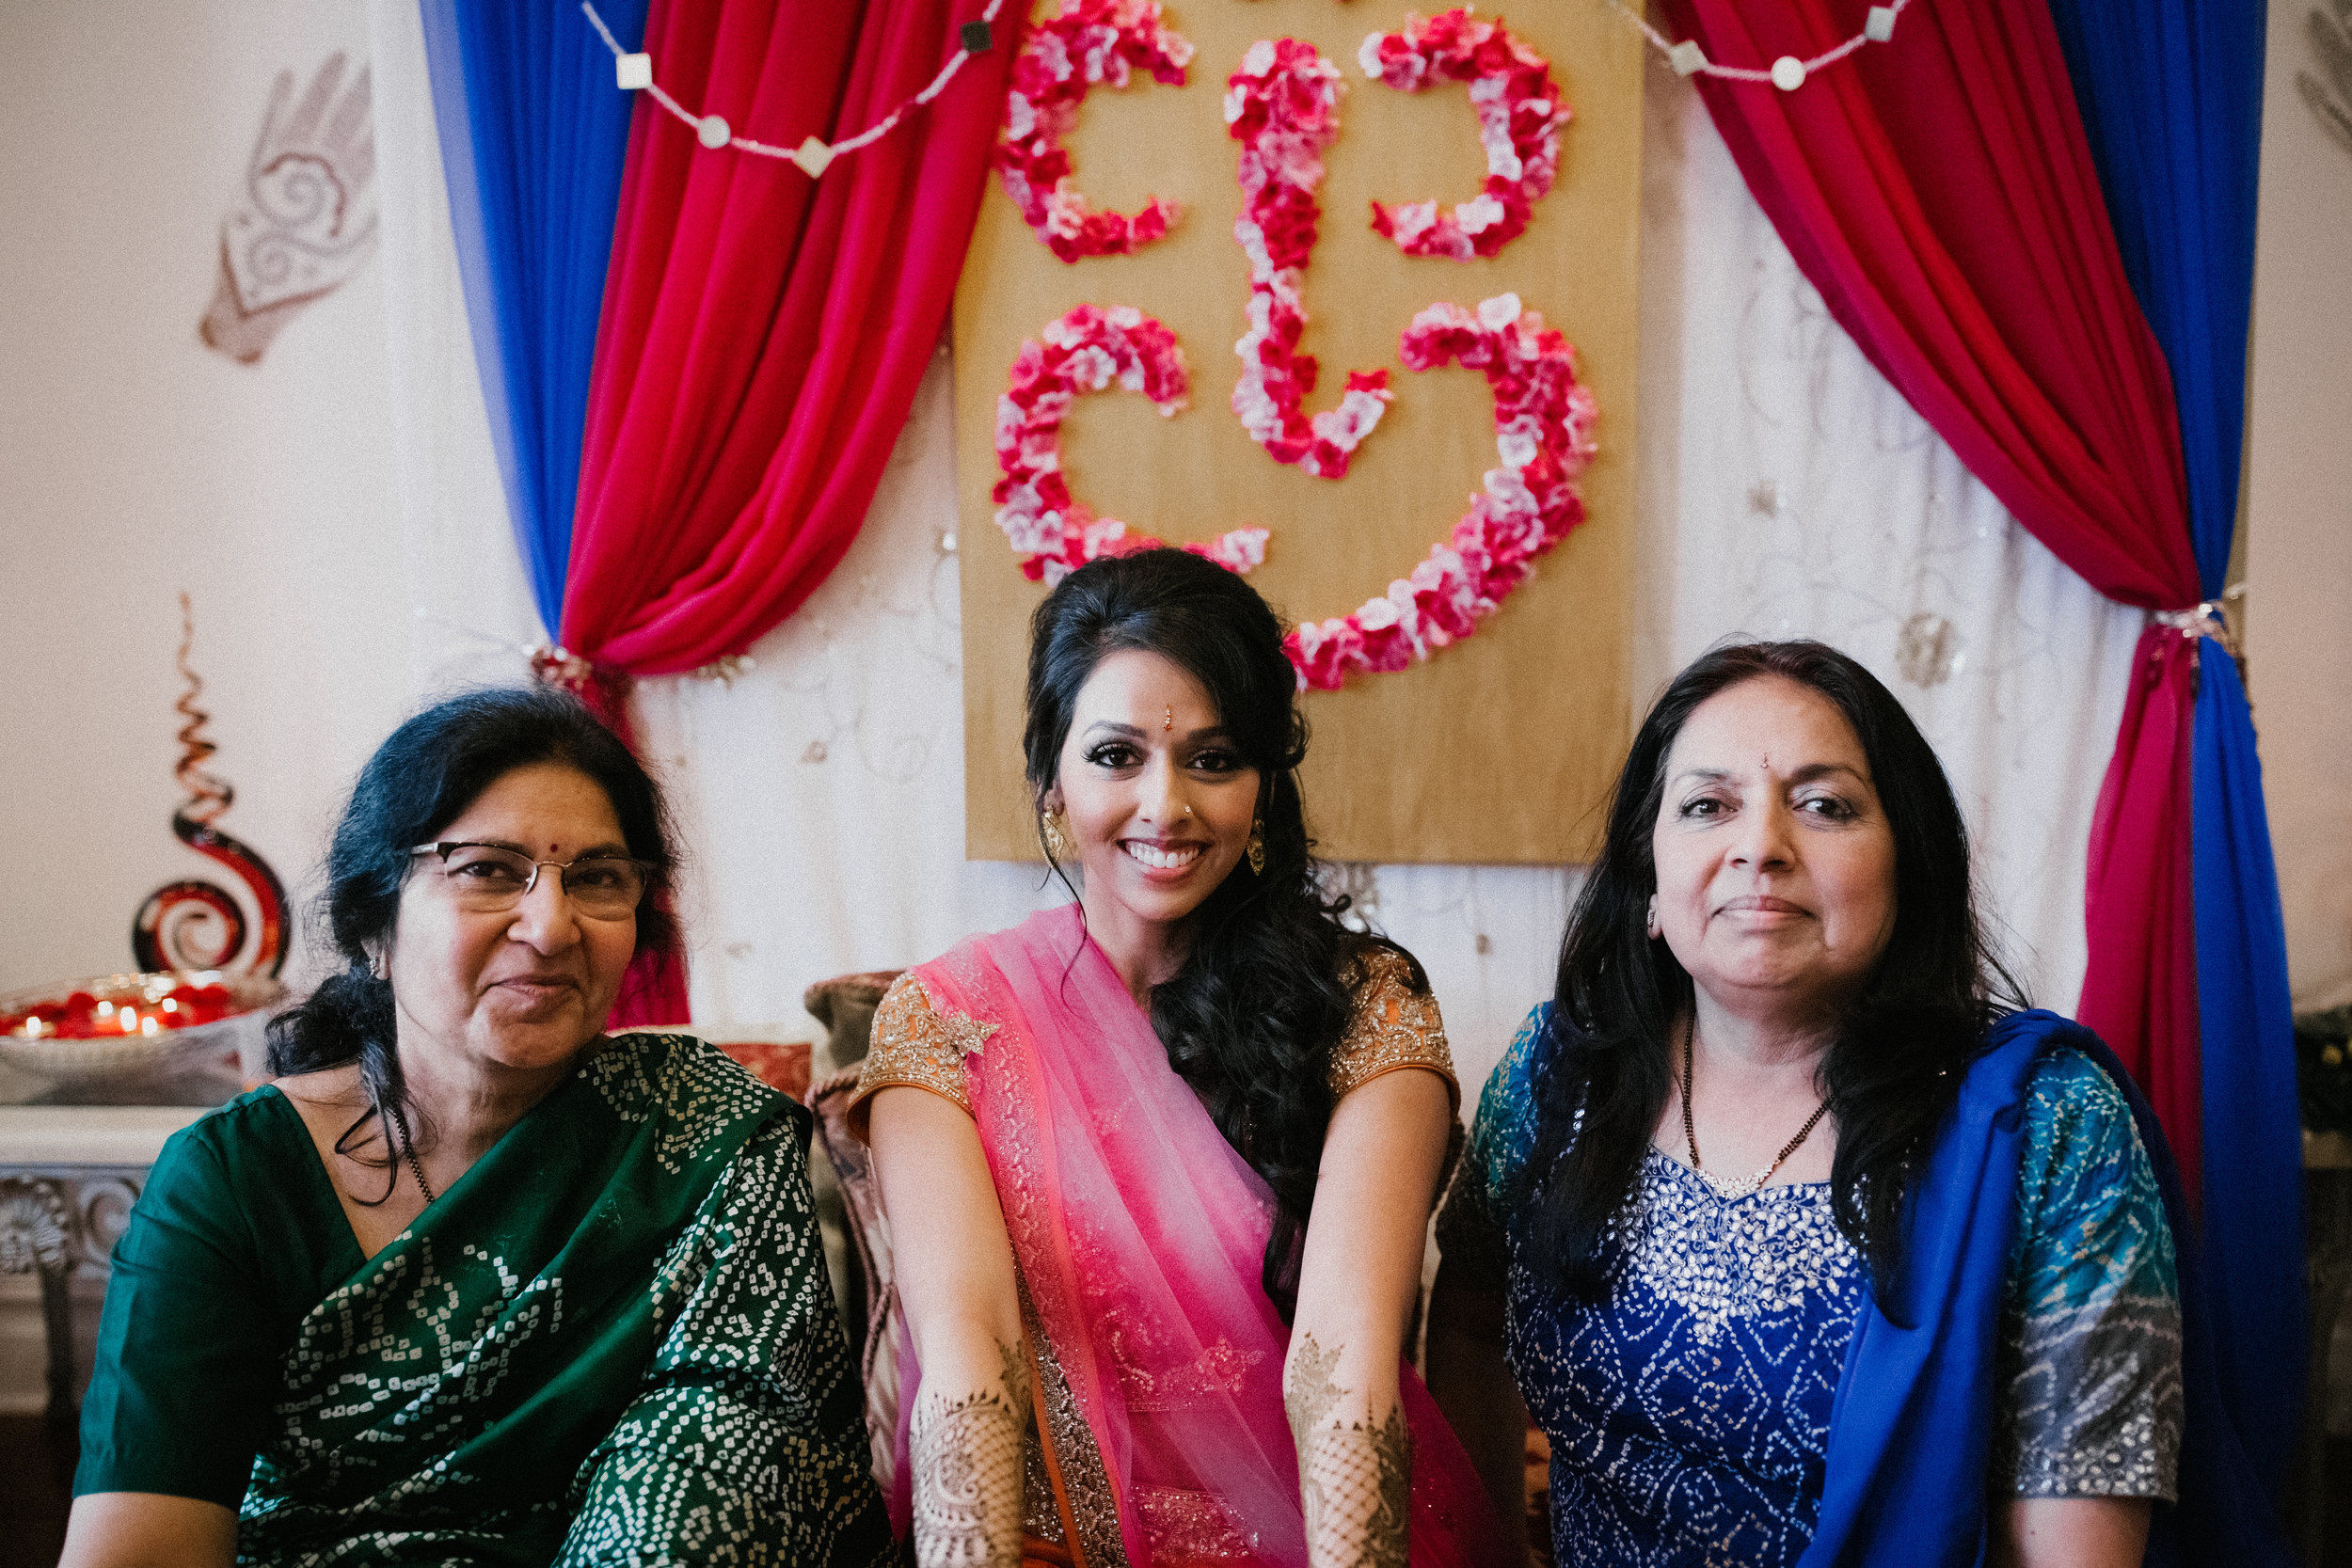 Aparna-Ankit-Patel-Mehndi-Wedding-Photos-0060.jpg